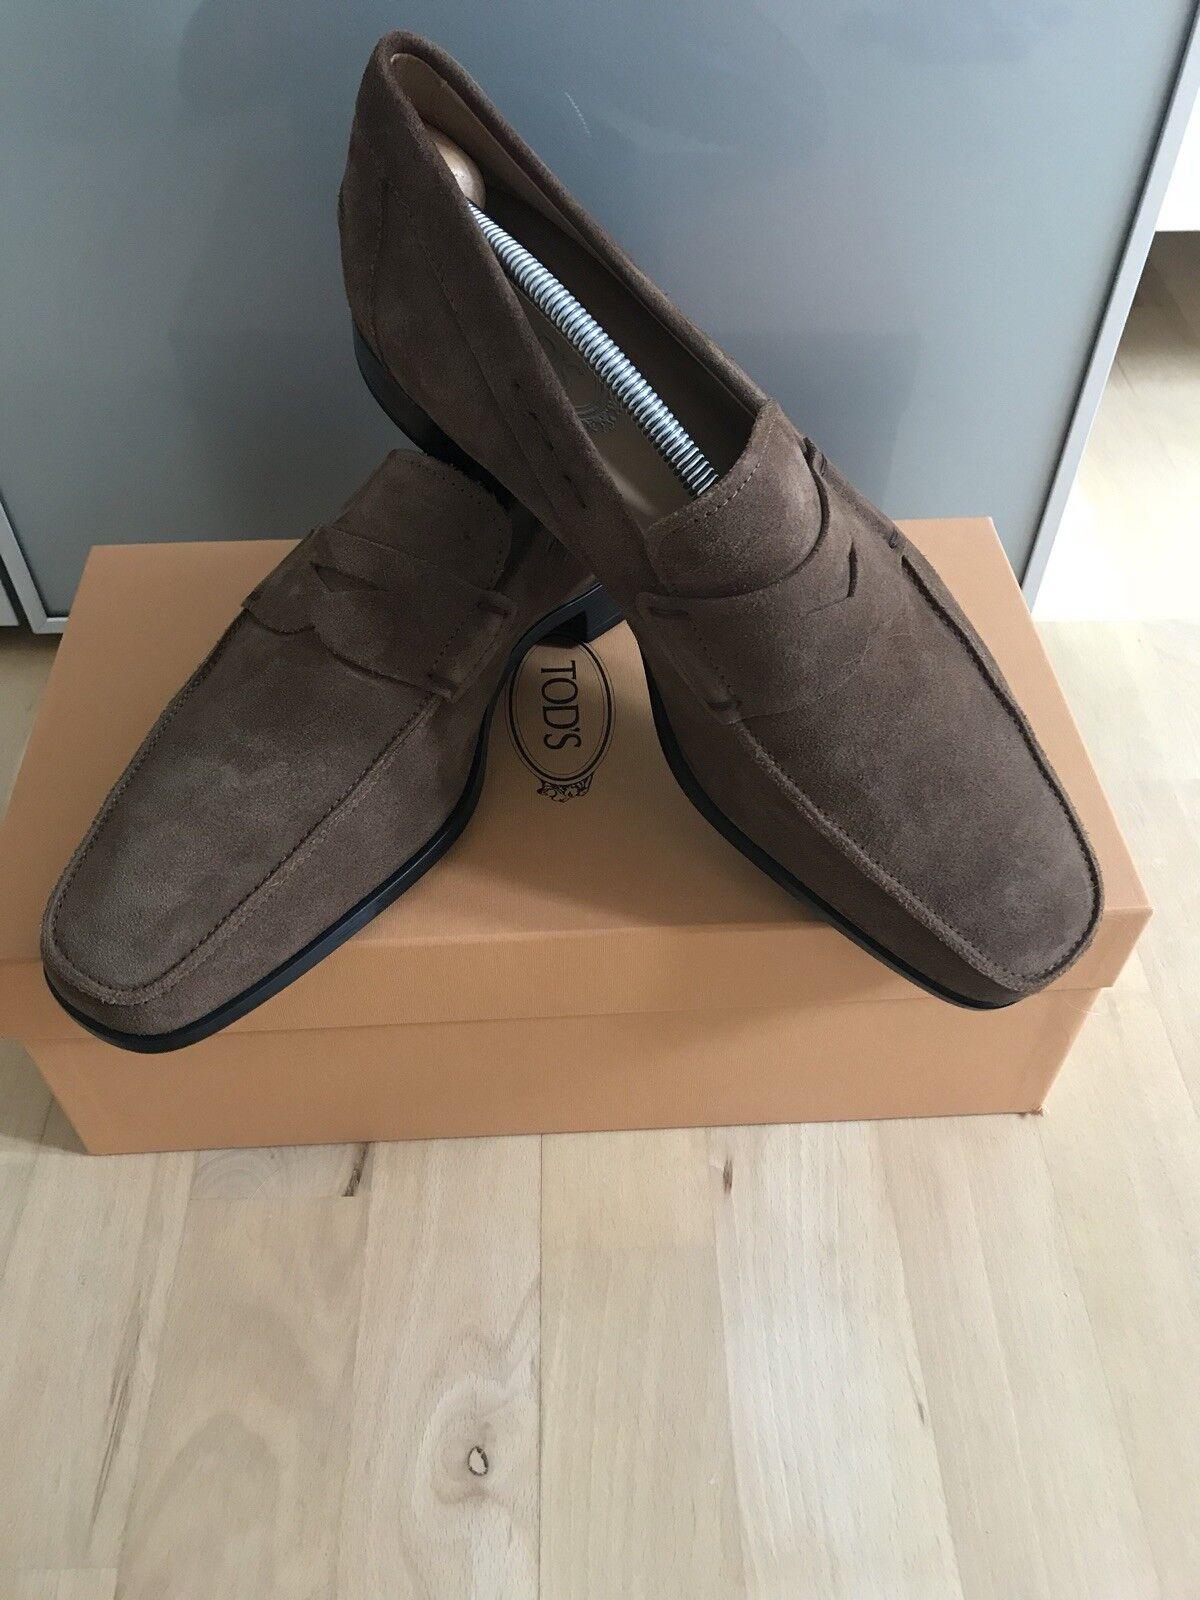 Tods Loafers Veloursleder Gr 8 1x getragen NP 390